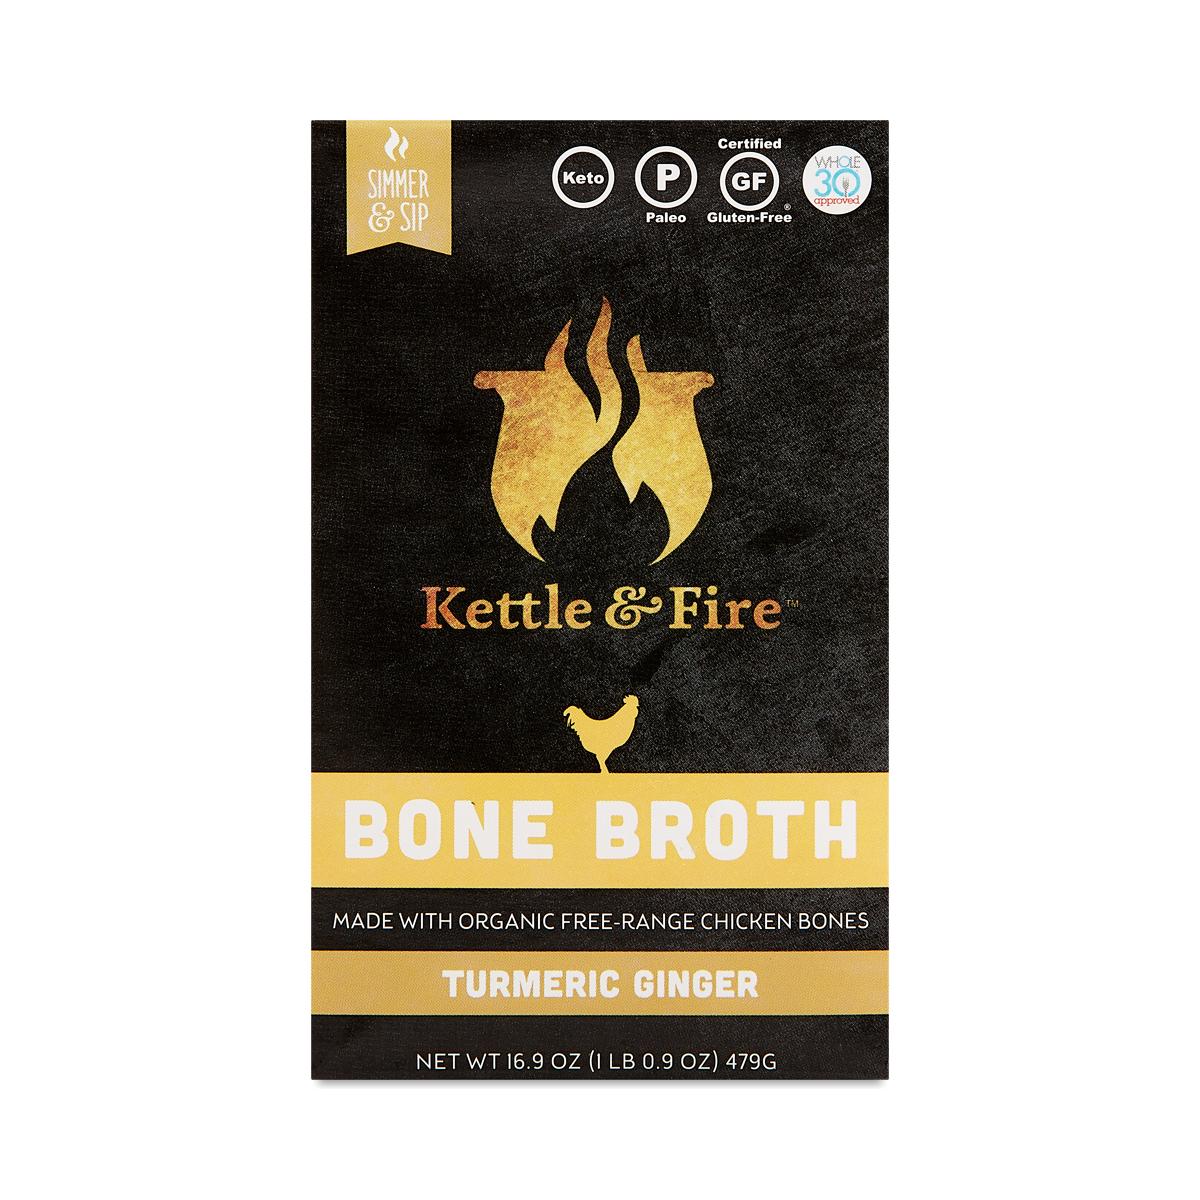 Kettle & Fire Bone Broth, Turmeric Ginger Chicken 16.9 oz carton